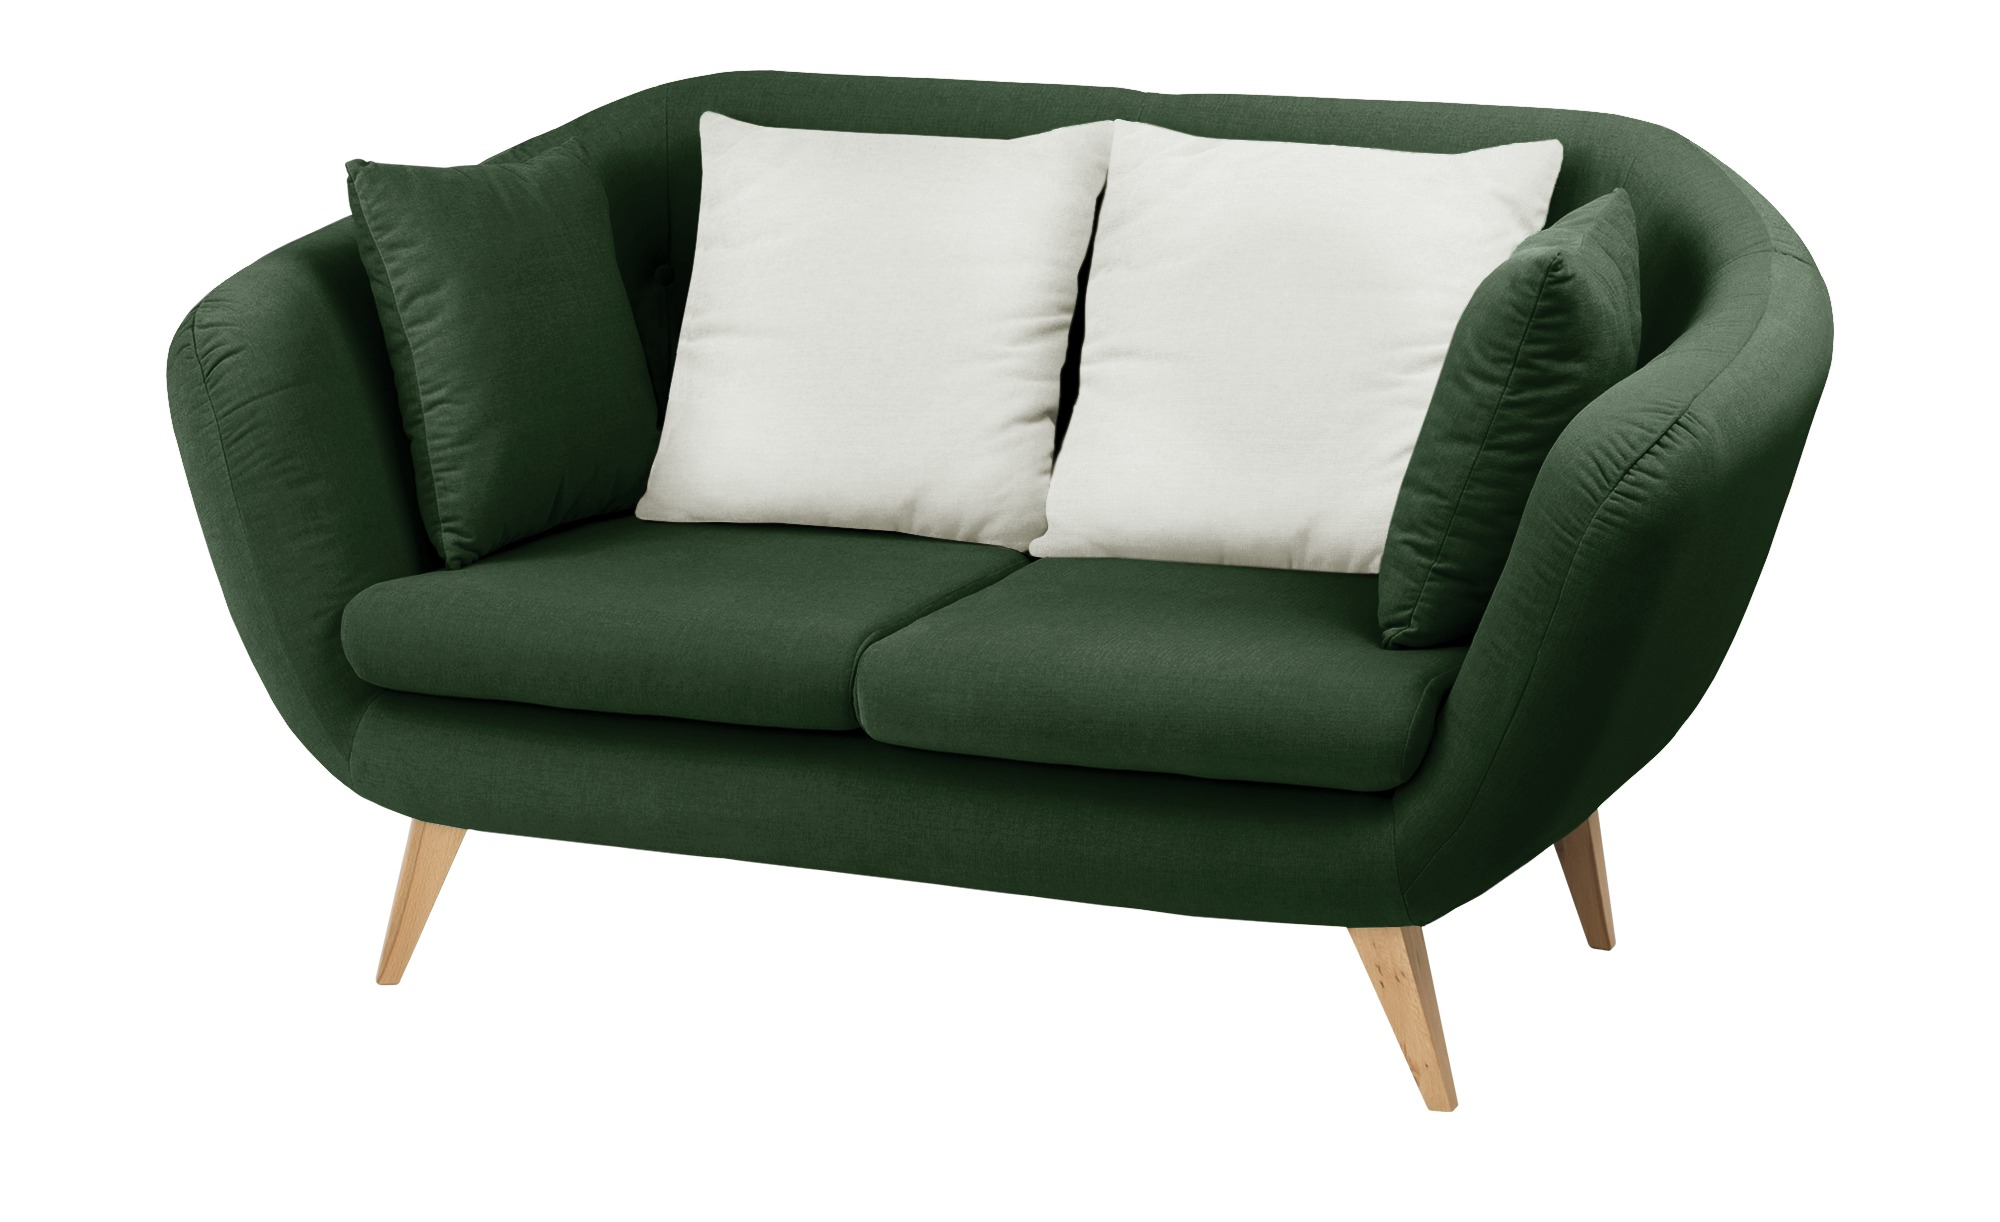 smart Sofa  grün - Mikrofaser Ricarda ¦ grün ¦ Maße (cm): B: 176 H: 93 T: 90 Polstermöbel > Sofas > 2-Sitzer - Höffner